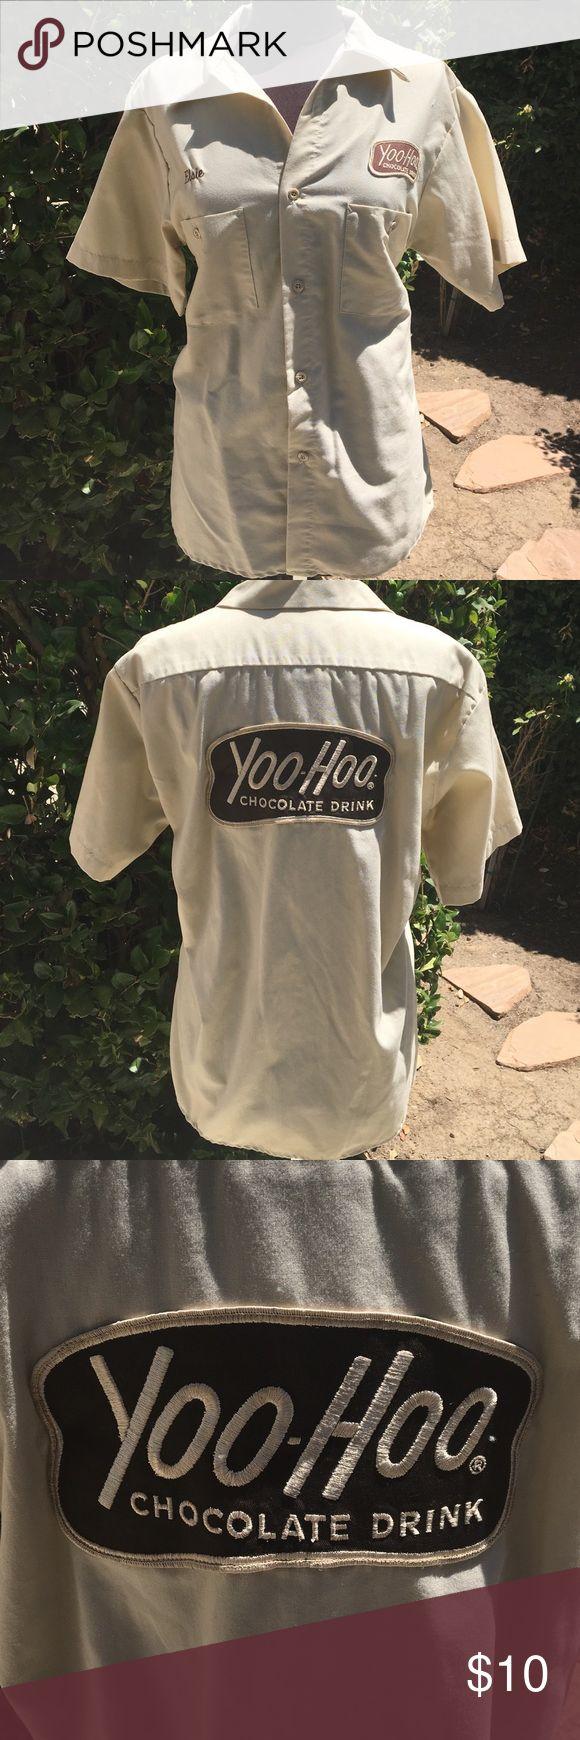 "Yoo-hoo Chocolate Drink SHIRT Industrial Shirt M 1/2 sleeve , Yoo-hoo Choc Drink Logo, name tag says ""Elsie"" .                 85% Polyester.    35% Cotton EWC  Tops Button Down Shirts"